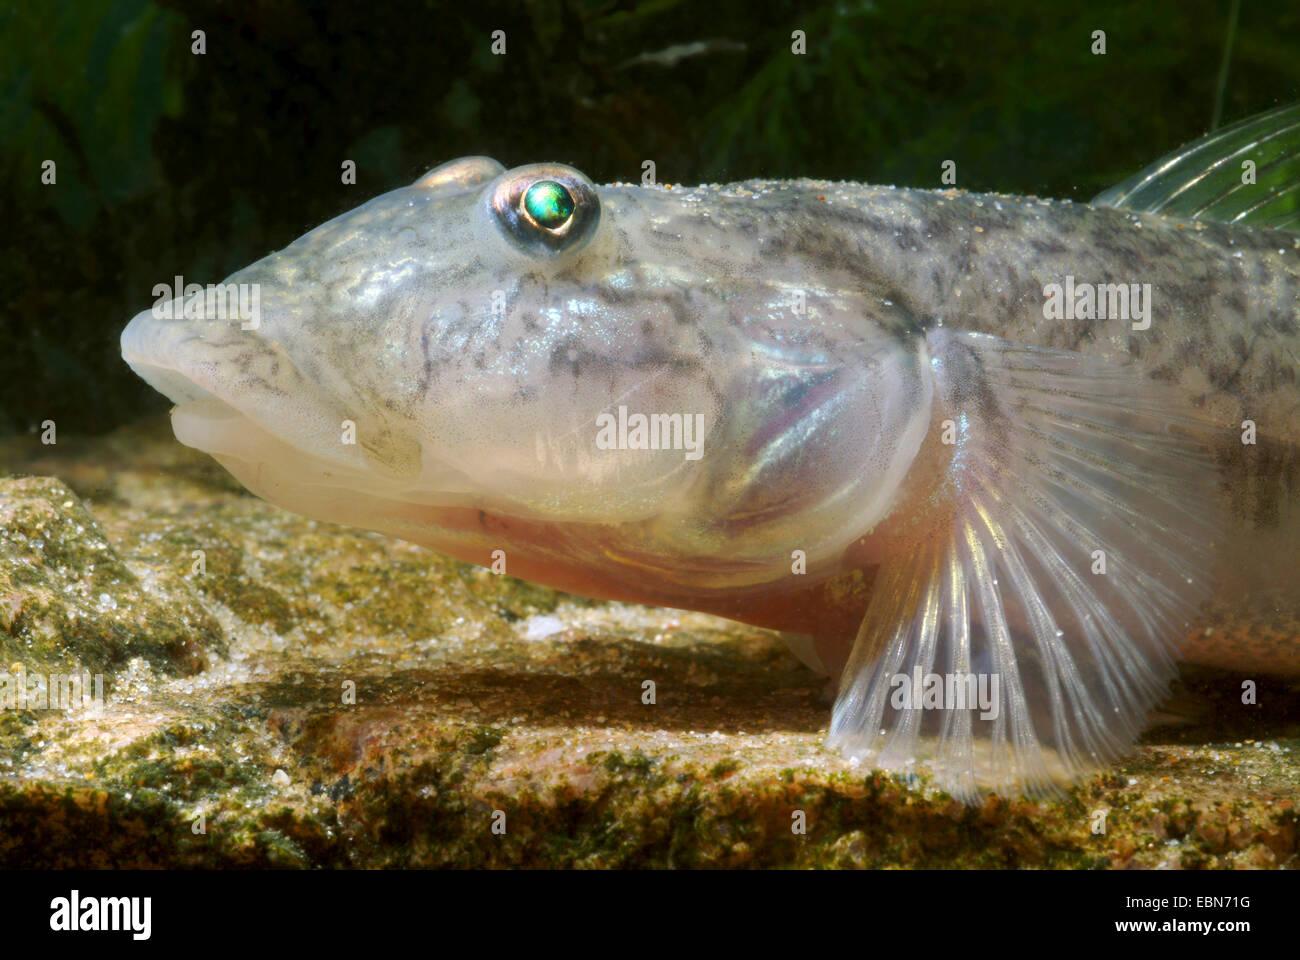 West African freshwater goby, Sideband Gobio (Awaous lateristriga, Gobius lateristriga, Chonophorus lateristriga, - Stock Image